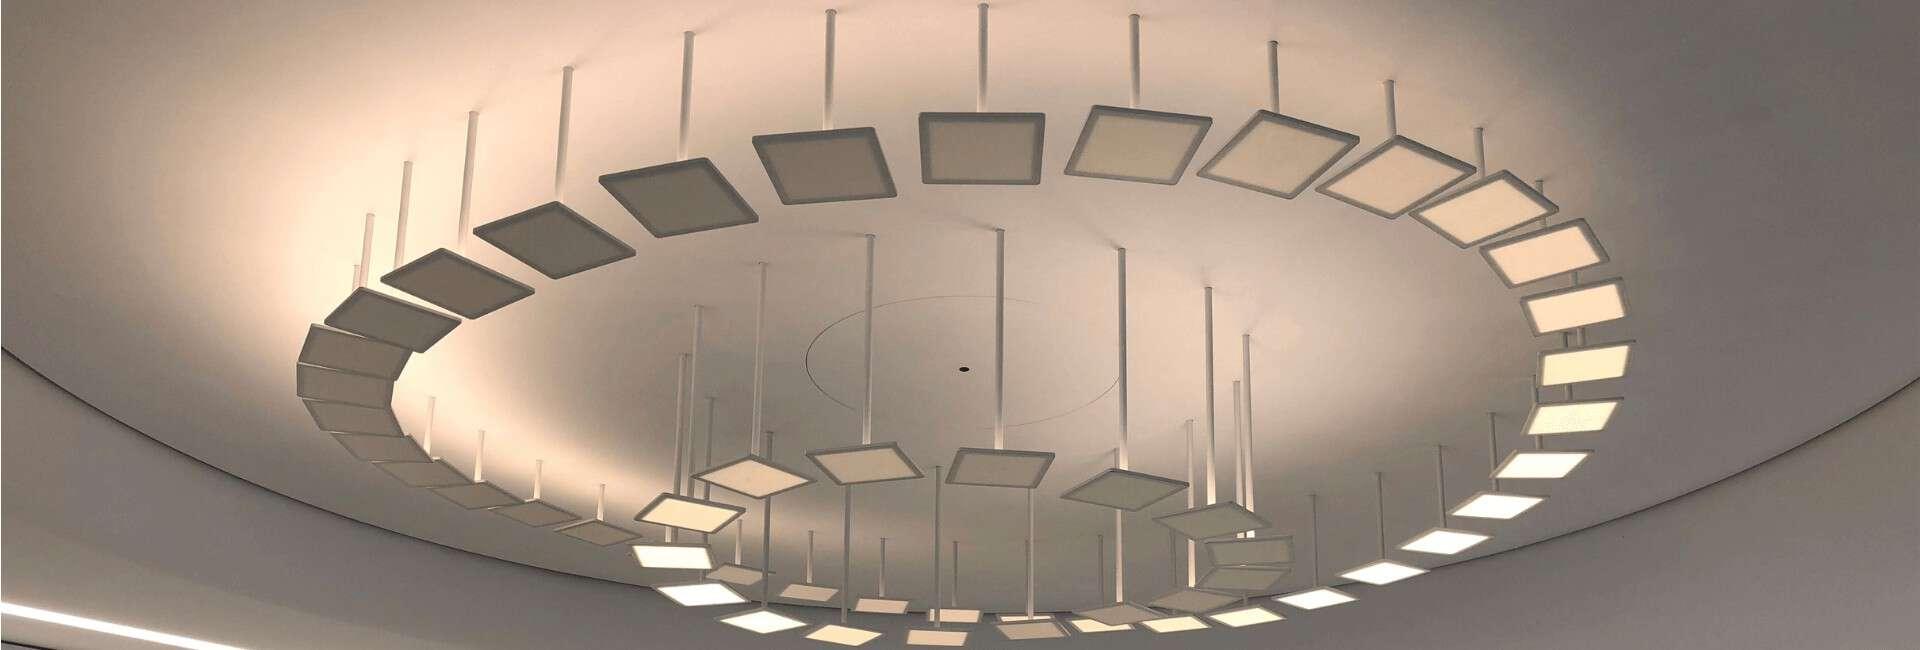 Interactive OLED installation